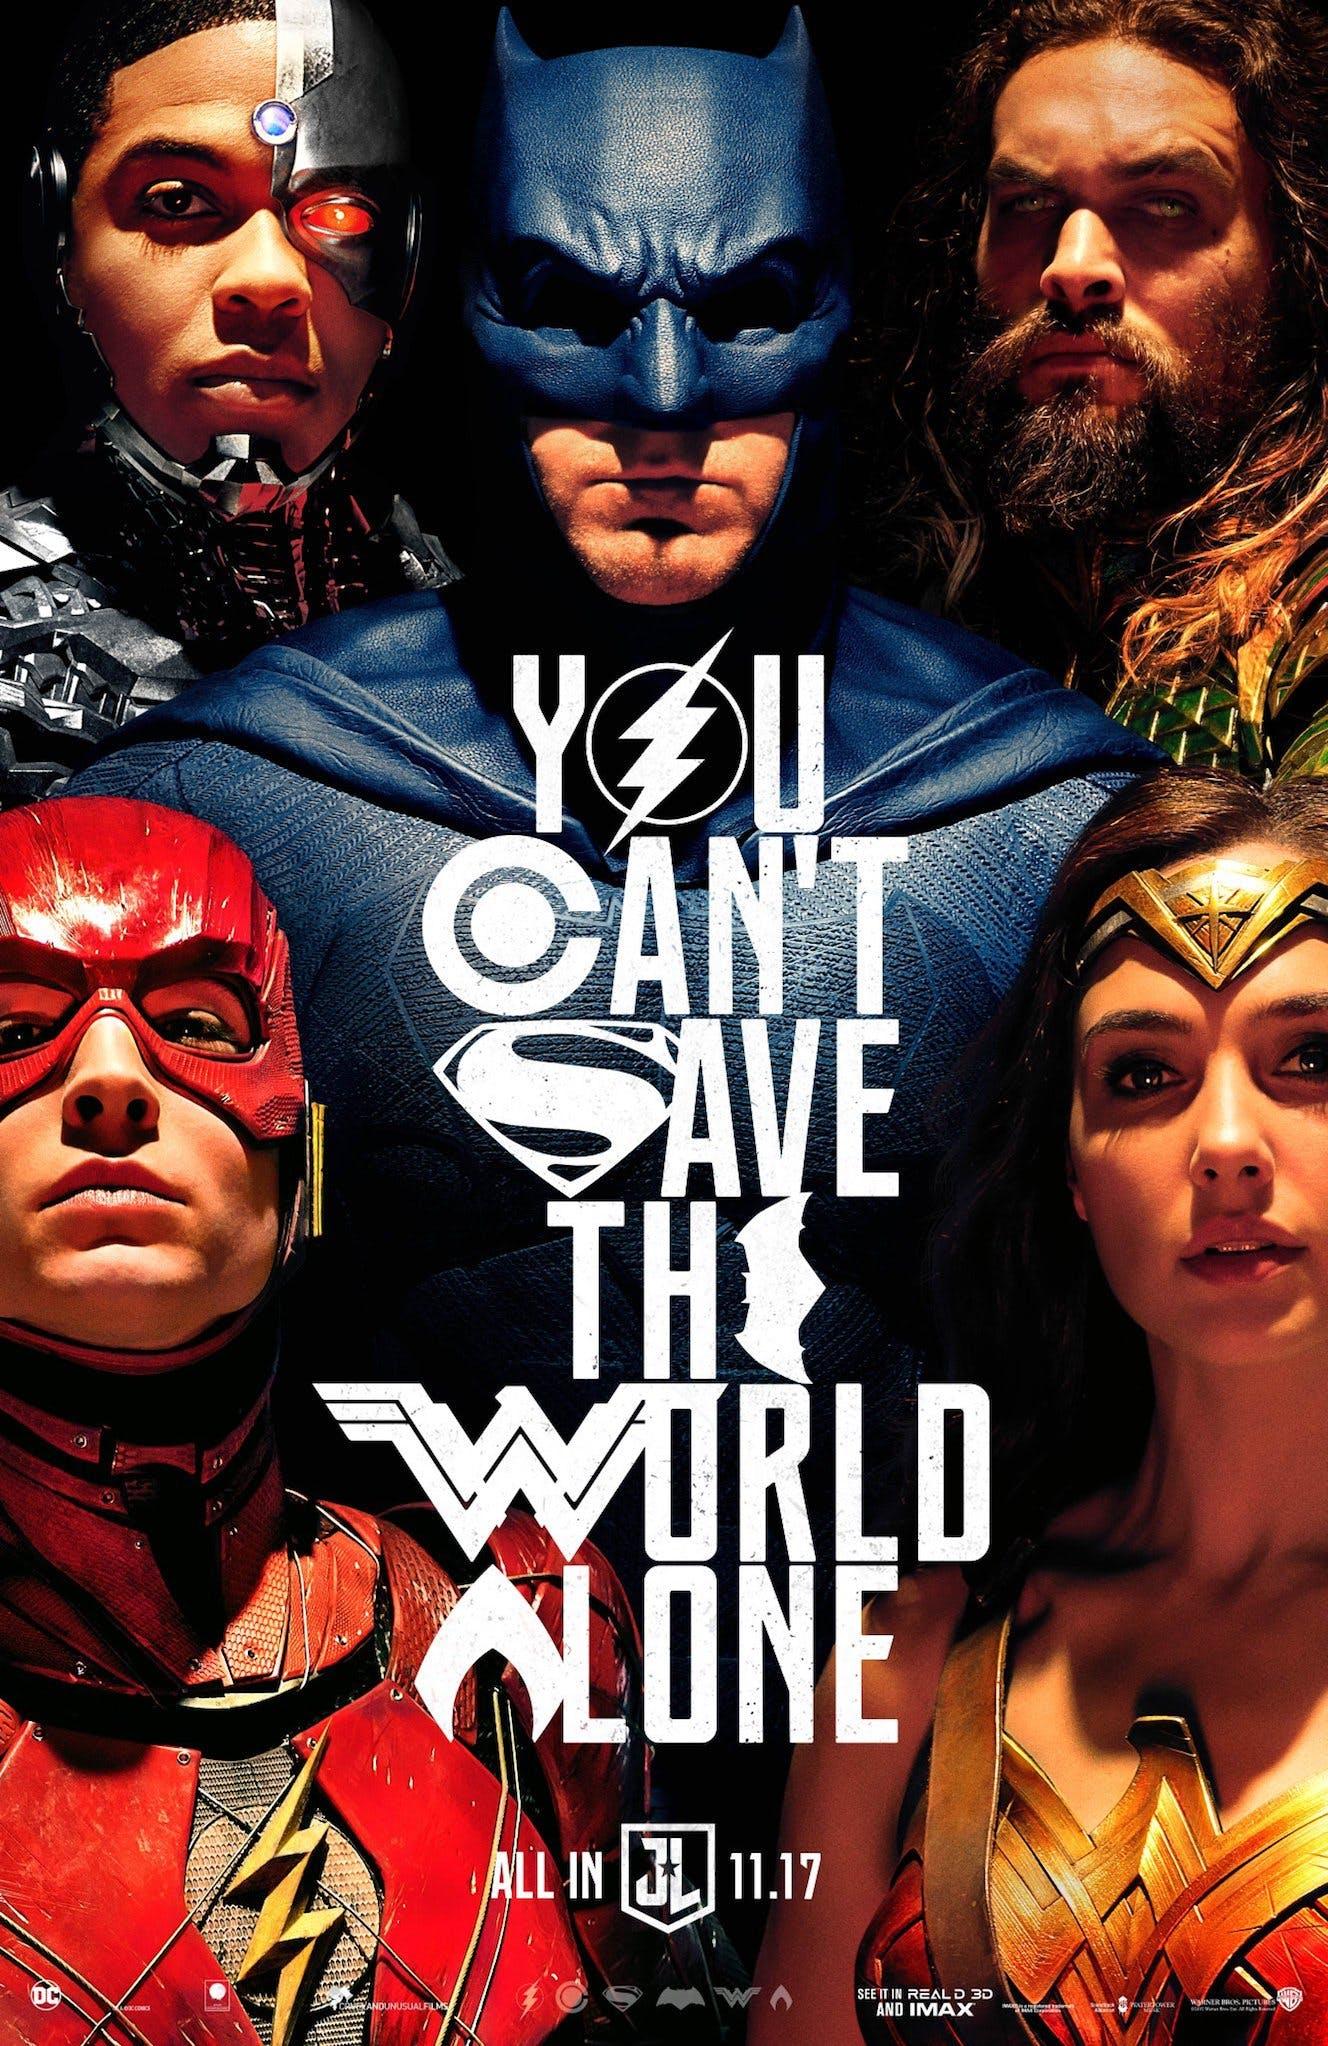 Justice League Poster/ Λεγεώνα Δικαιοσύνης Αφίσα